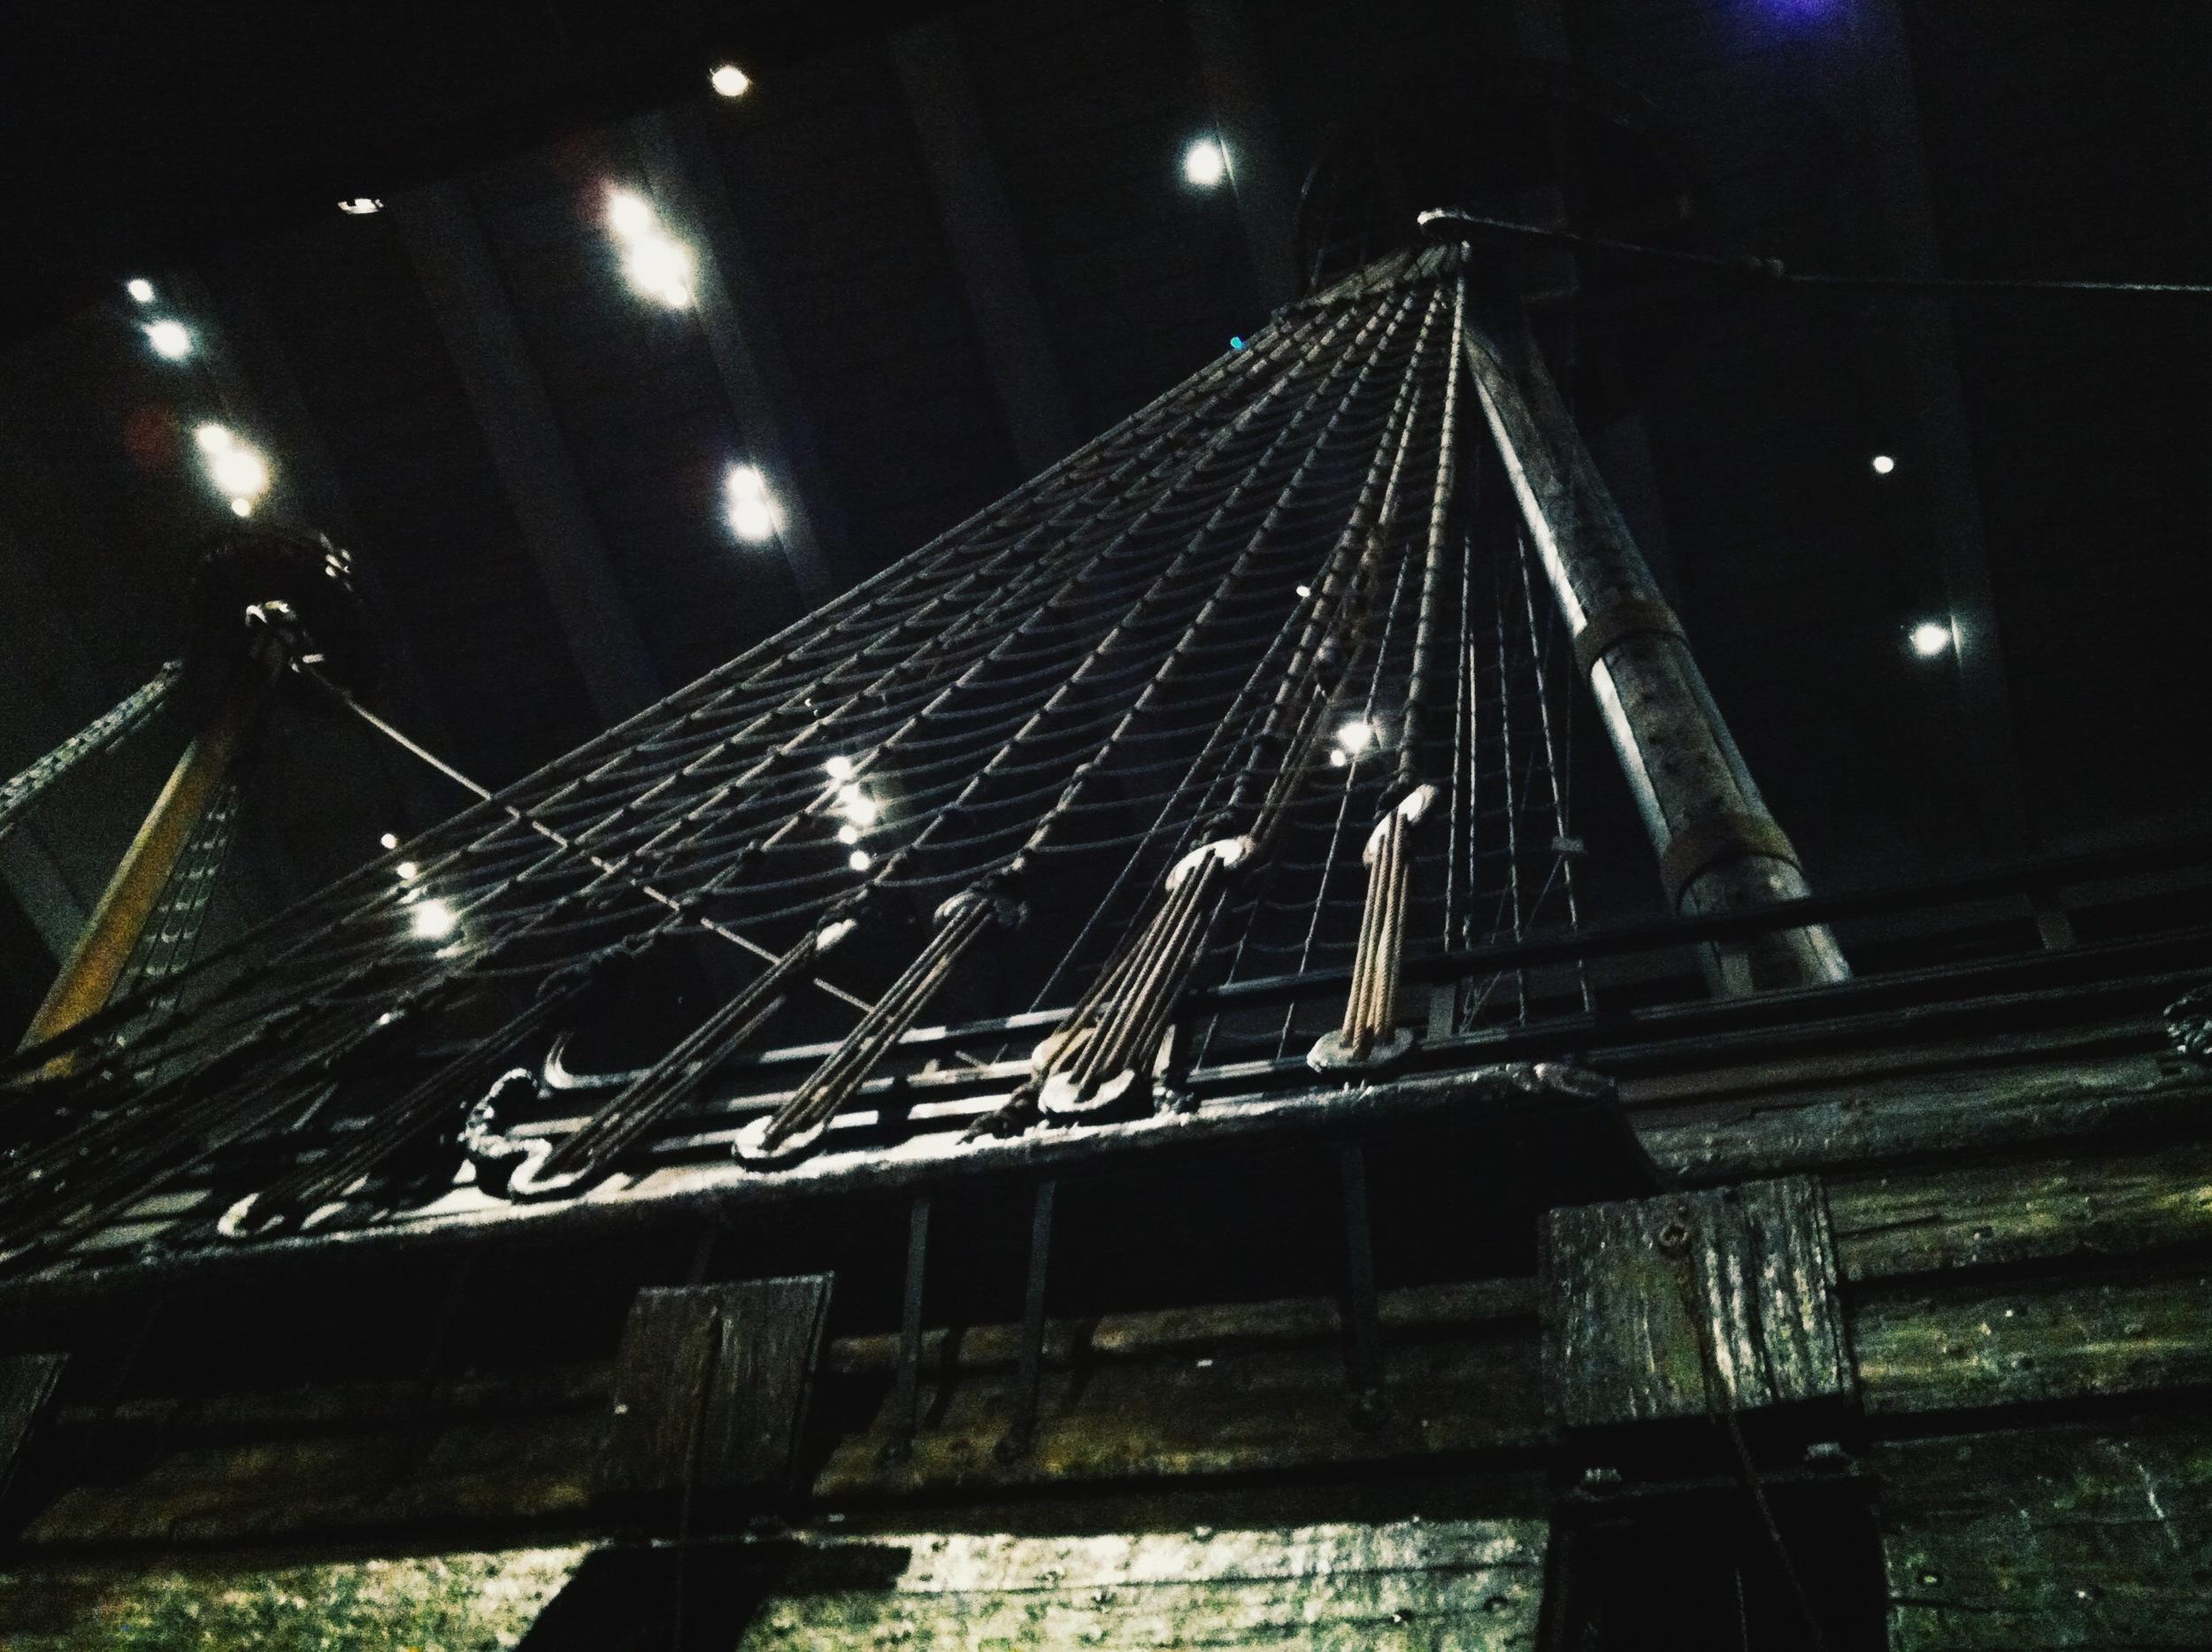 the grand Vasa at the Vasamuseet